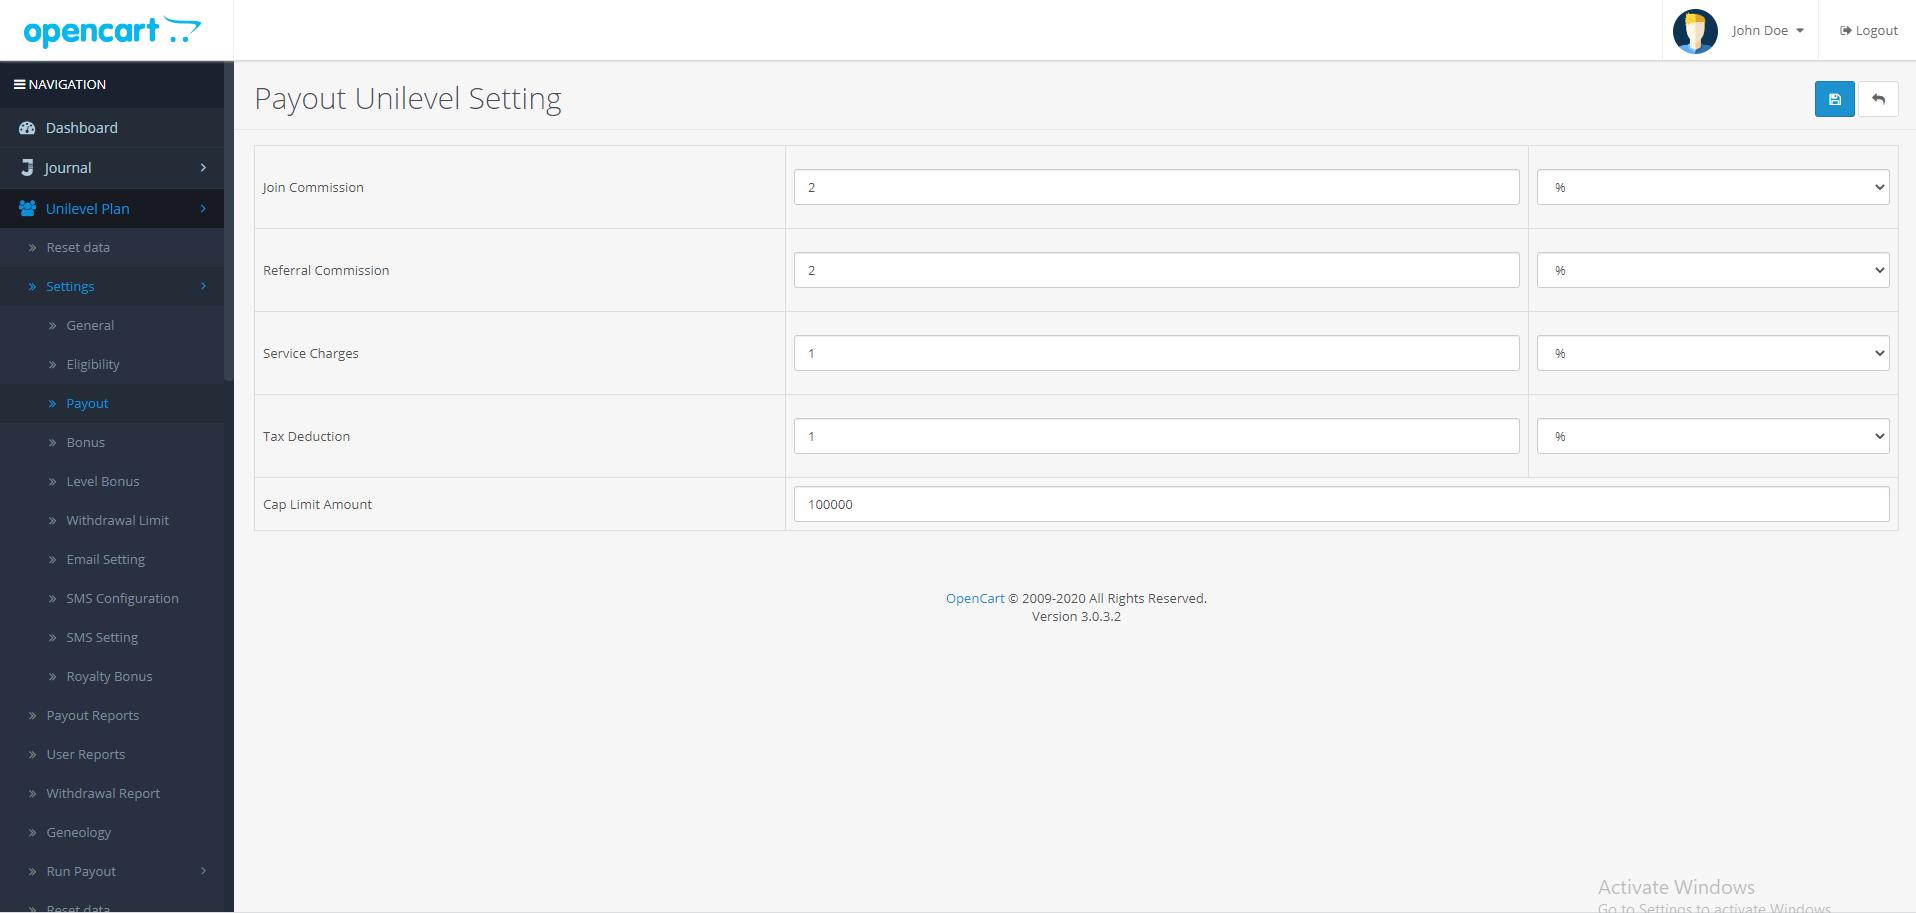 |'Opencart'| |'letscms'| |'opencart unilevel mlm plan'| |'payout'| |'Dashboard'| |'unilevel mlm plan'| |'mlm'| |'mlm Plan'|  |'setting'| |'new users'| |'unilevel'| |'unilevel mlm extension'| |'costomer list'| |'new users'| |'Installer'| |'mlmtrees.com'| |'mlm plan'| |'extension'| |'Opencart mlm plan'|